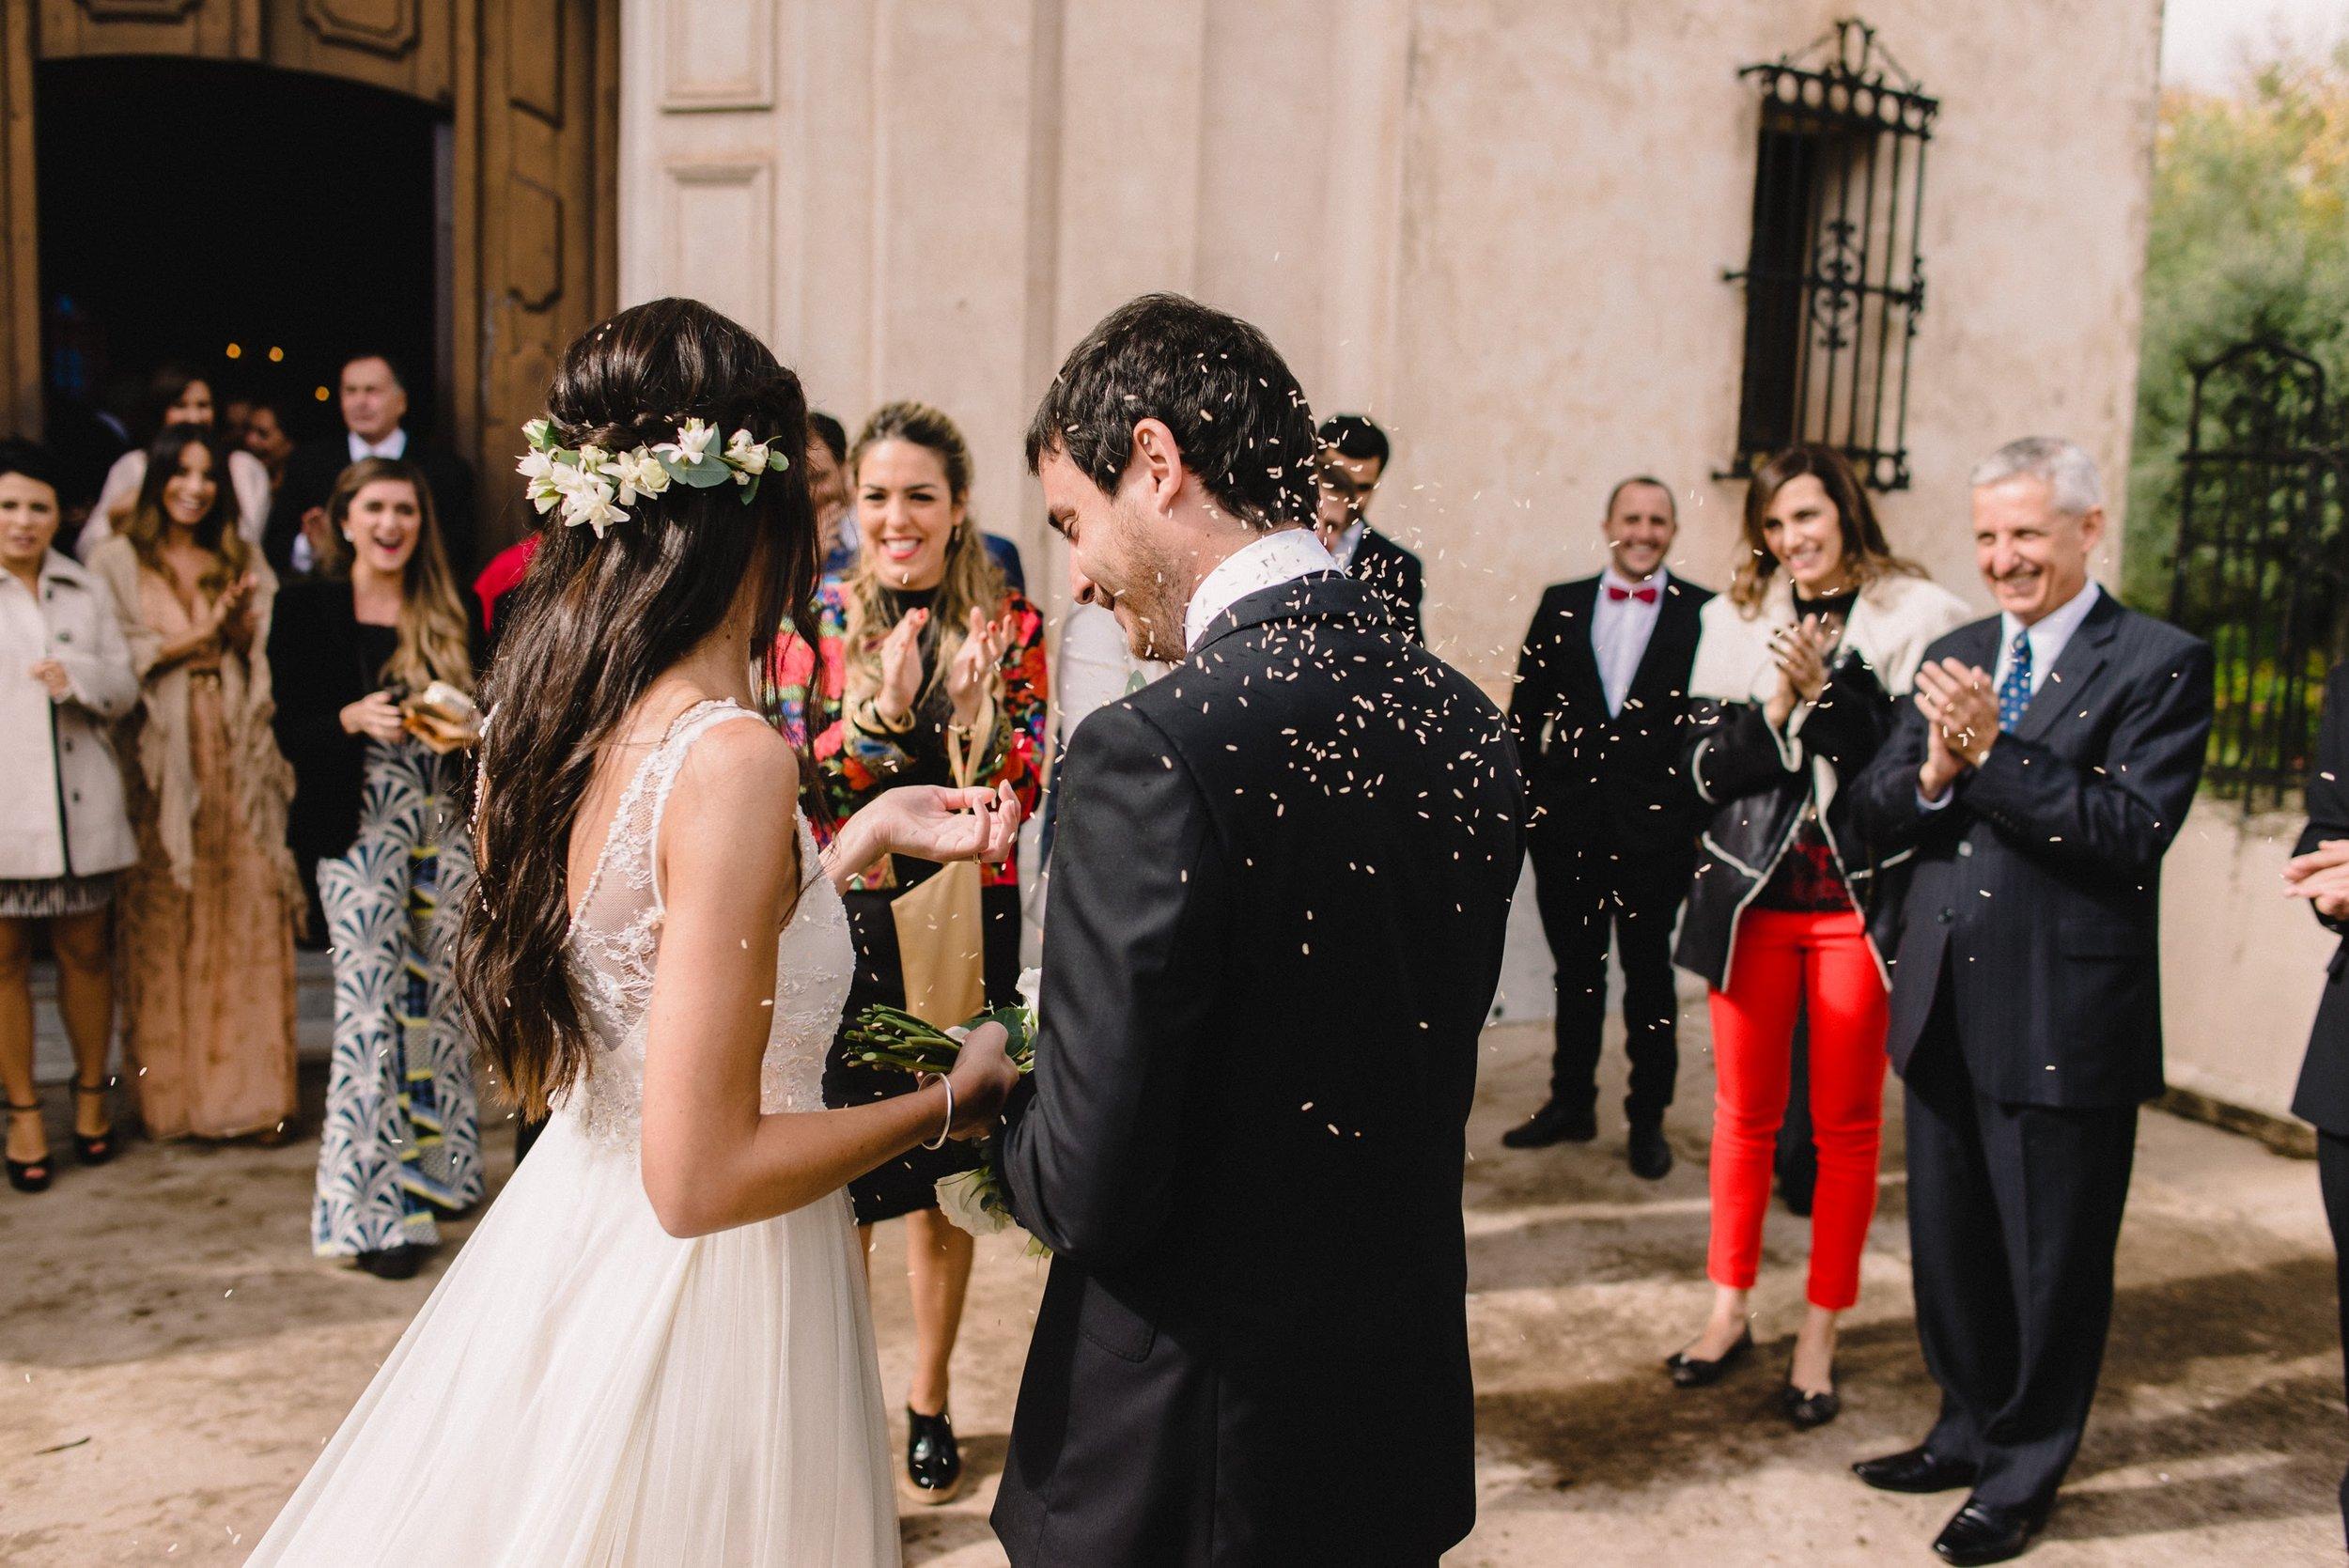 fotografo de bodas en carlos paz cordoba 038.JPG